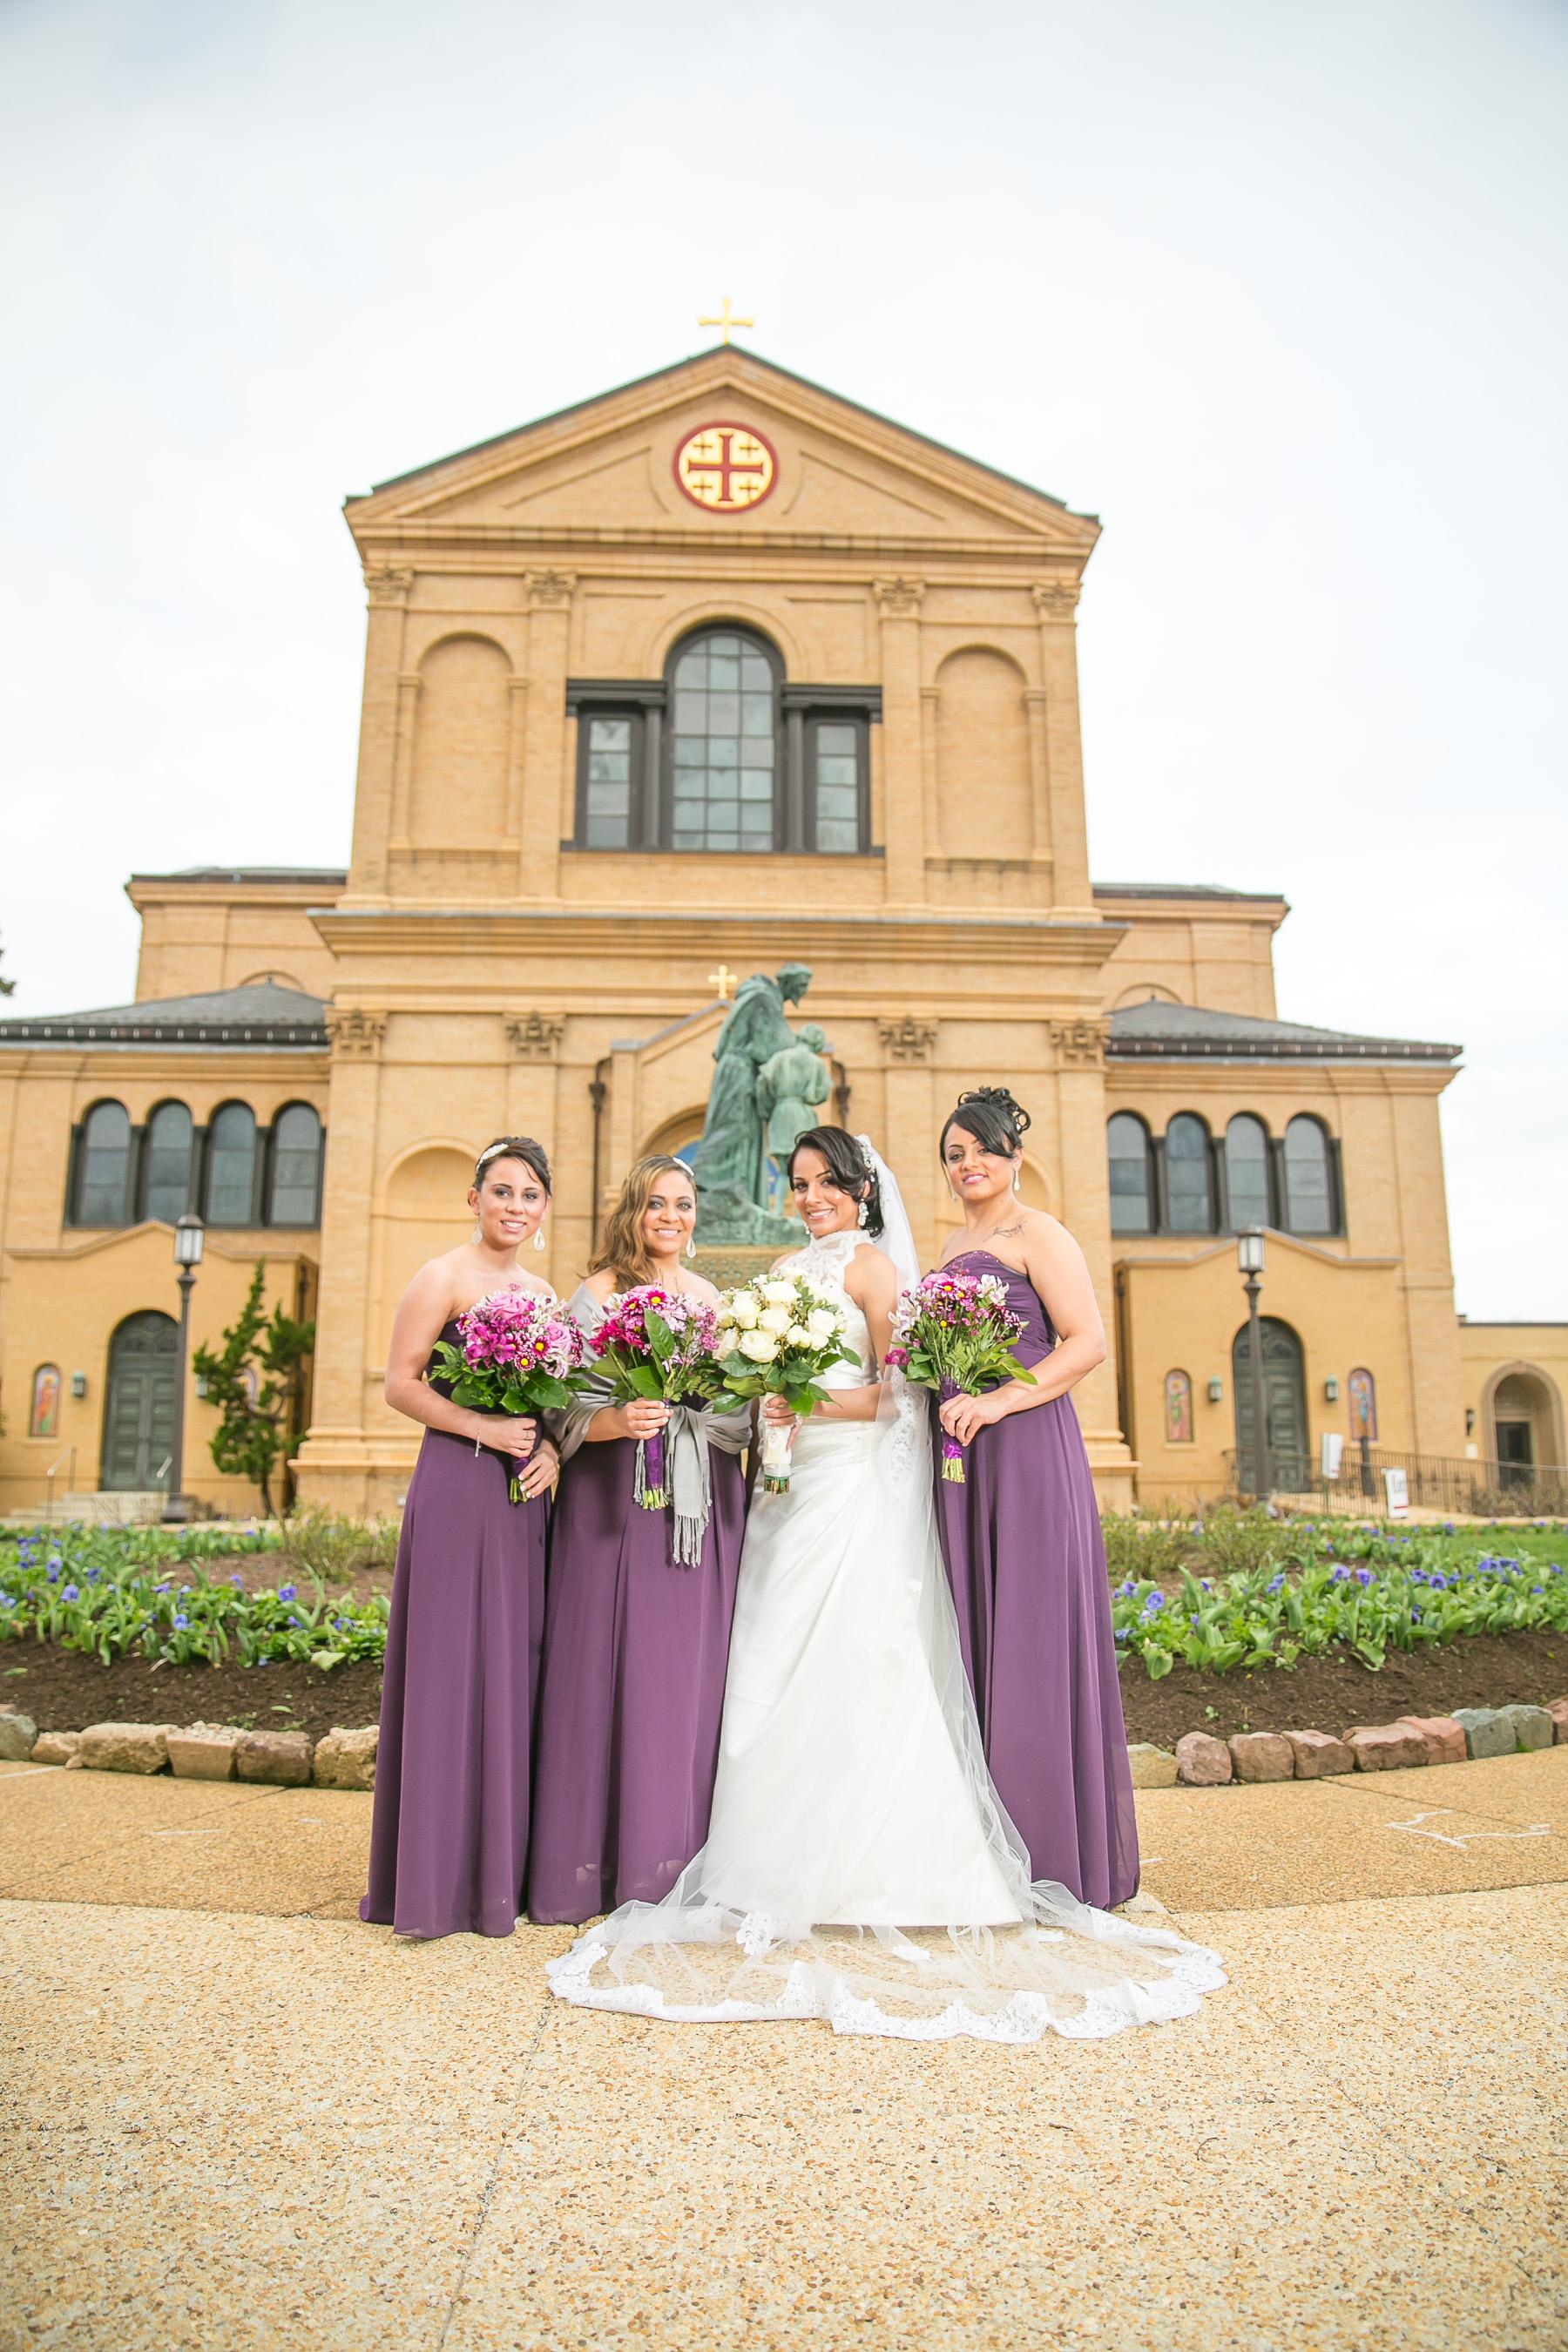 Bradly-and-Jesenia-Wedding-WQ-209.jpg